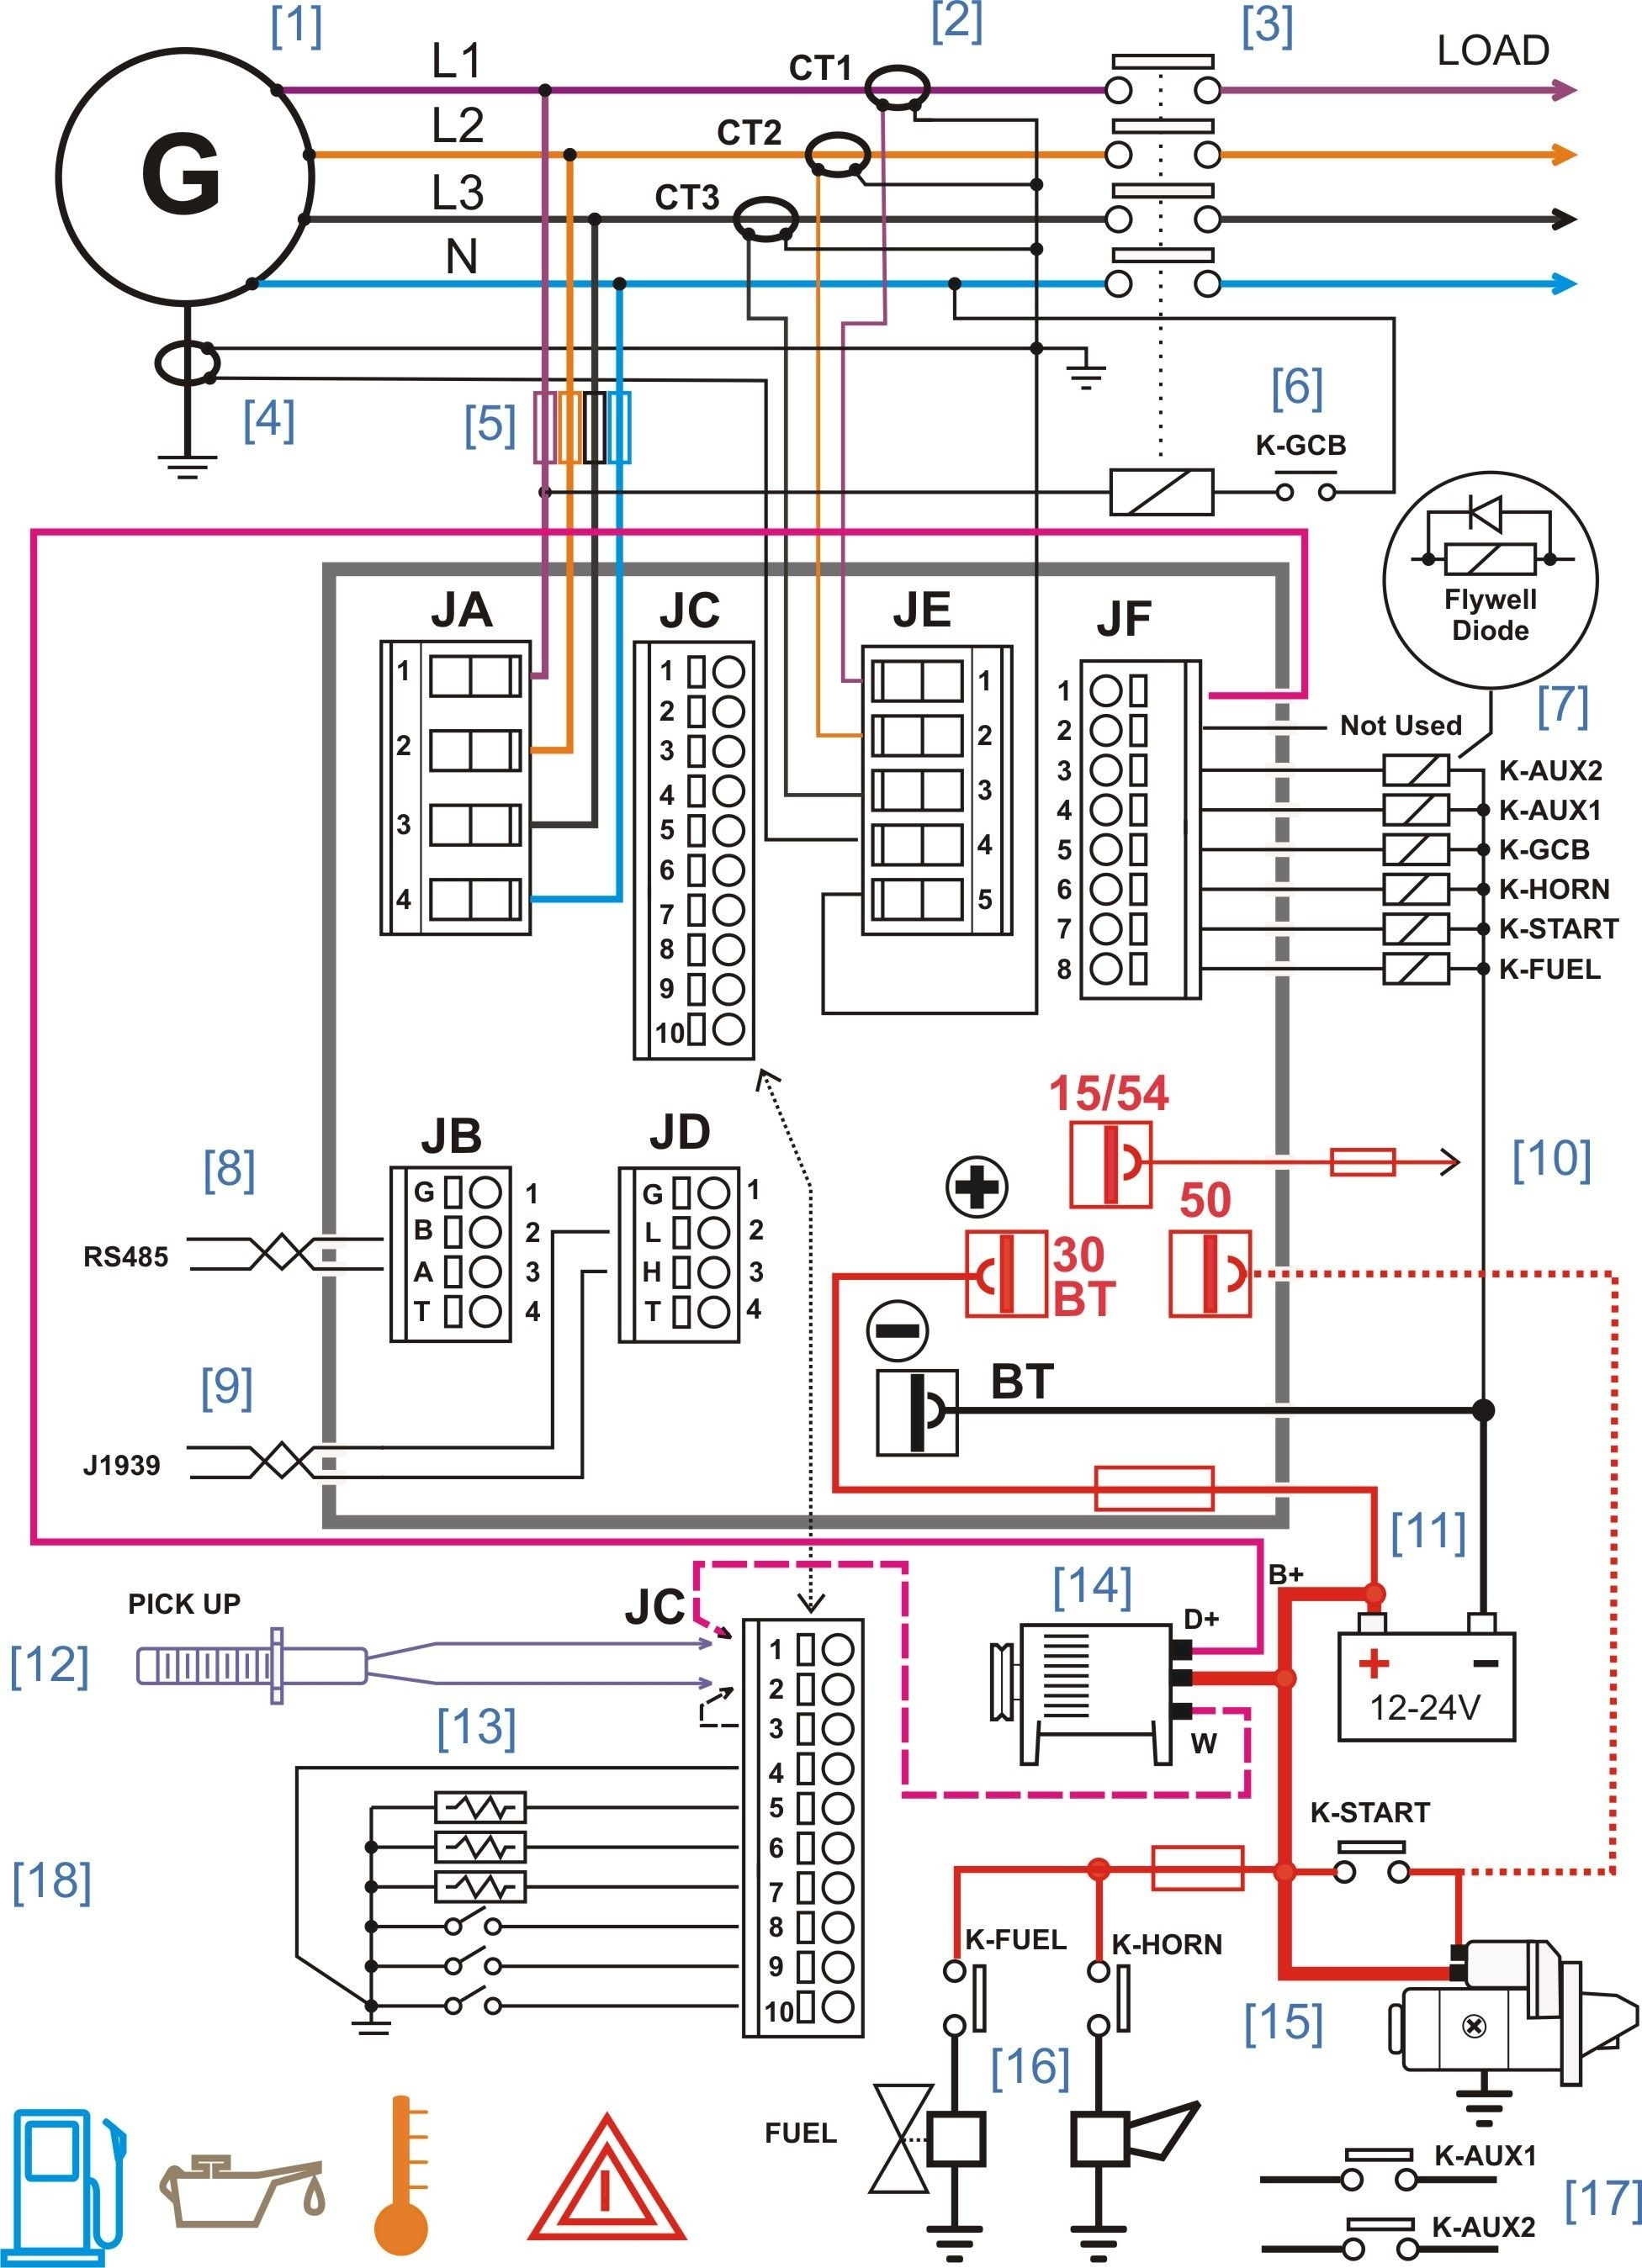 motor control panel wiring diagram Download-Wiring Diagram Motor Control System Save Diesel Generator Control Panel Wiring Diagram 14-b